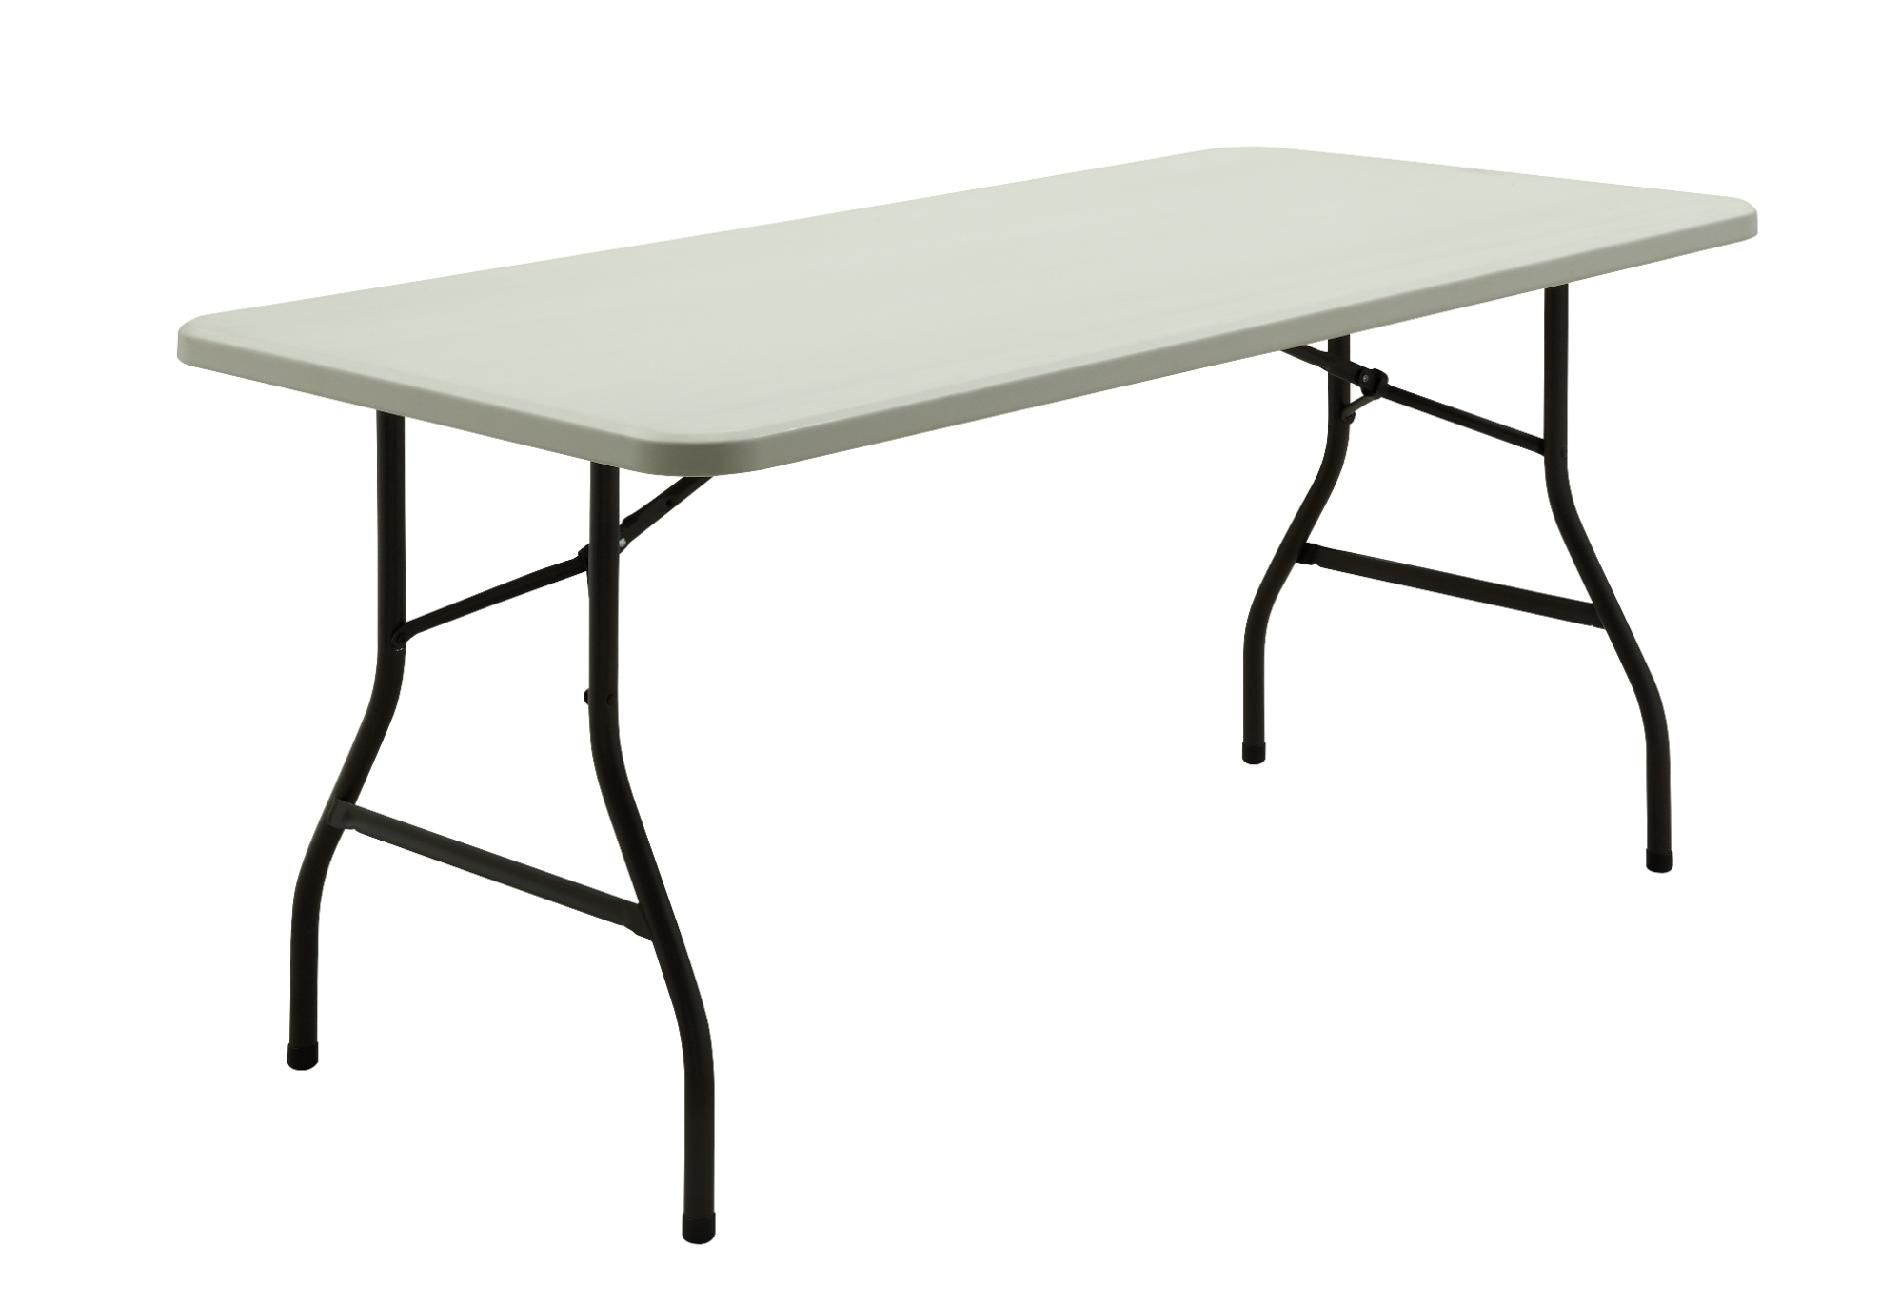 30 Northwest Territory Folding Table 5ft Folding Table Adjustable Height Table Work Table